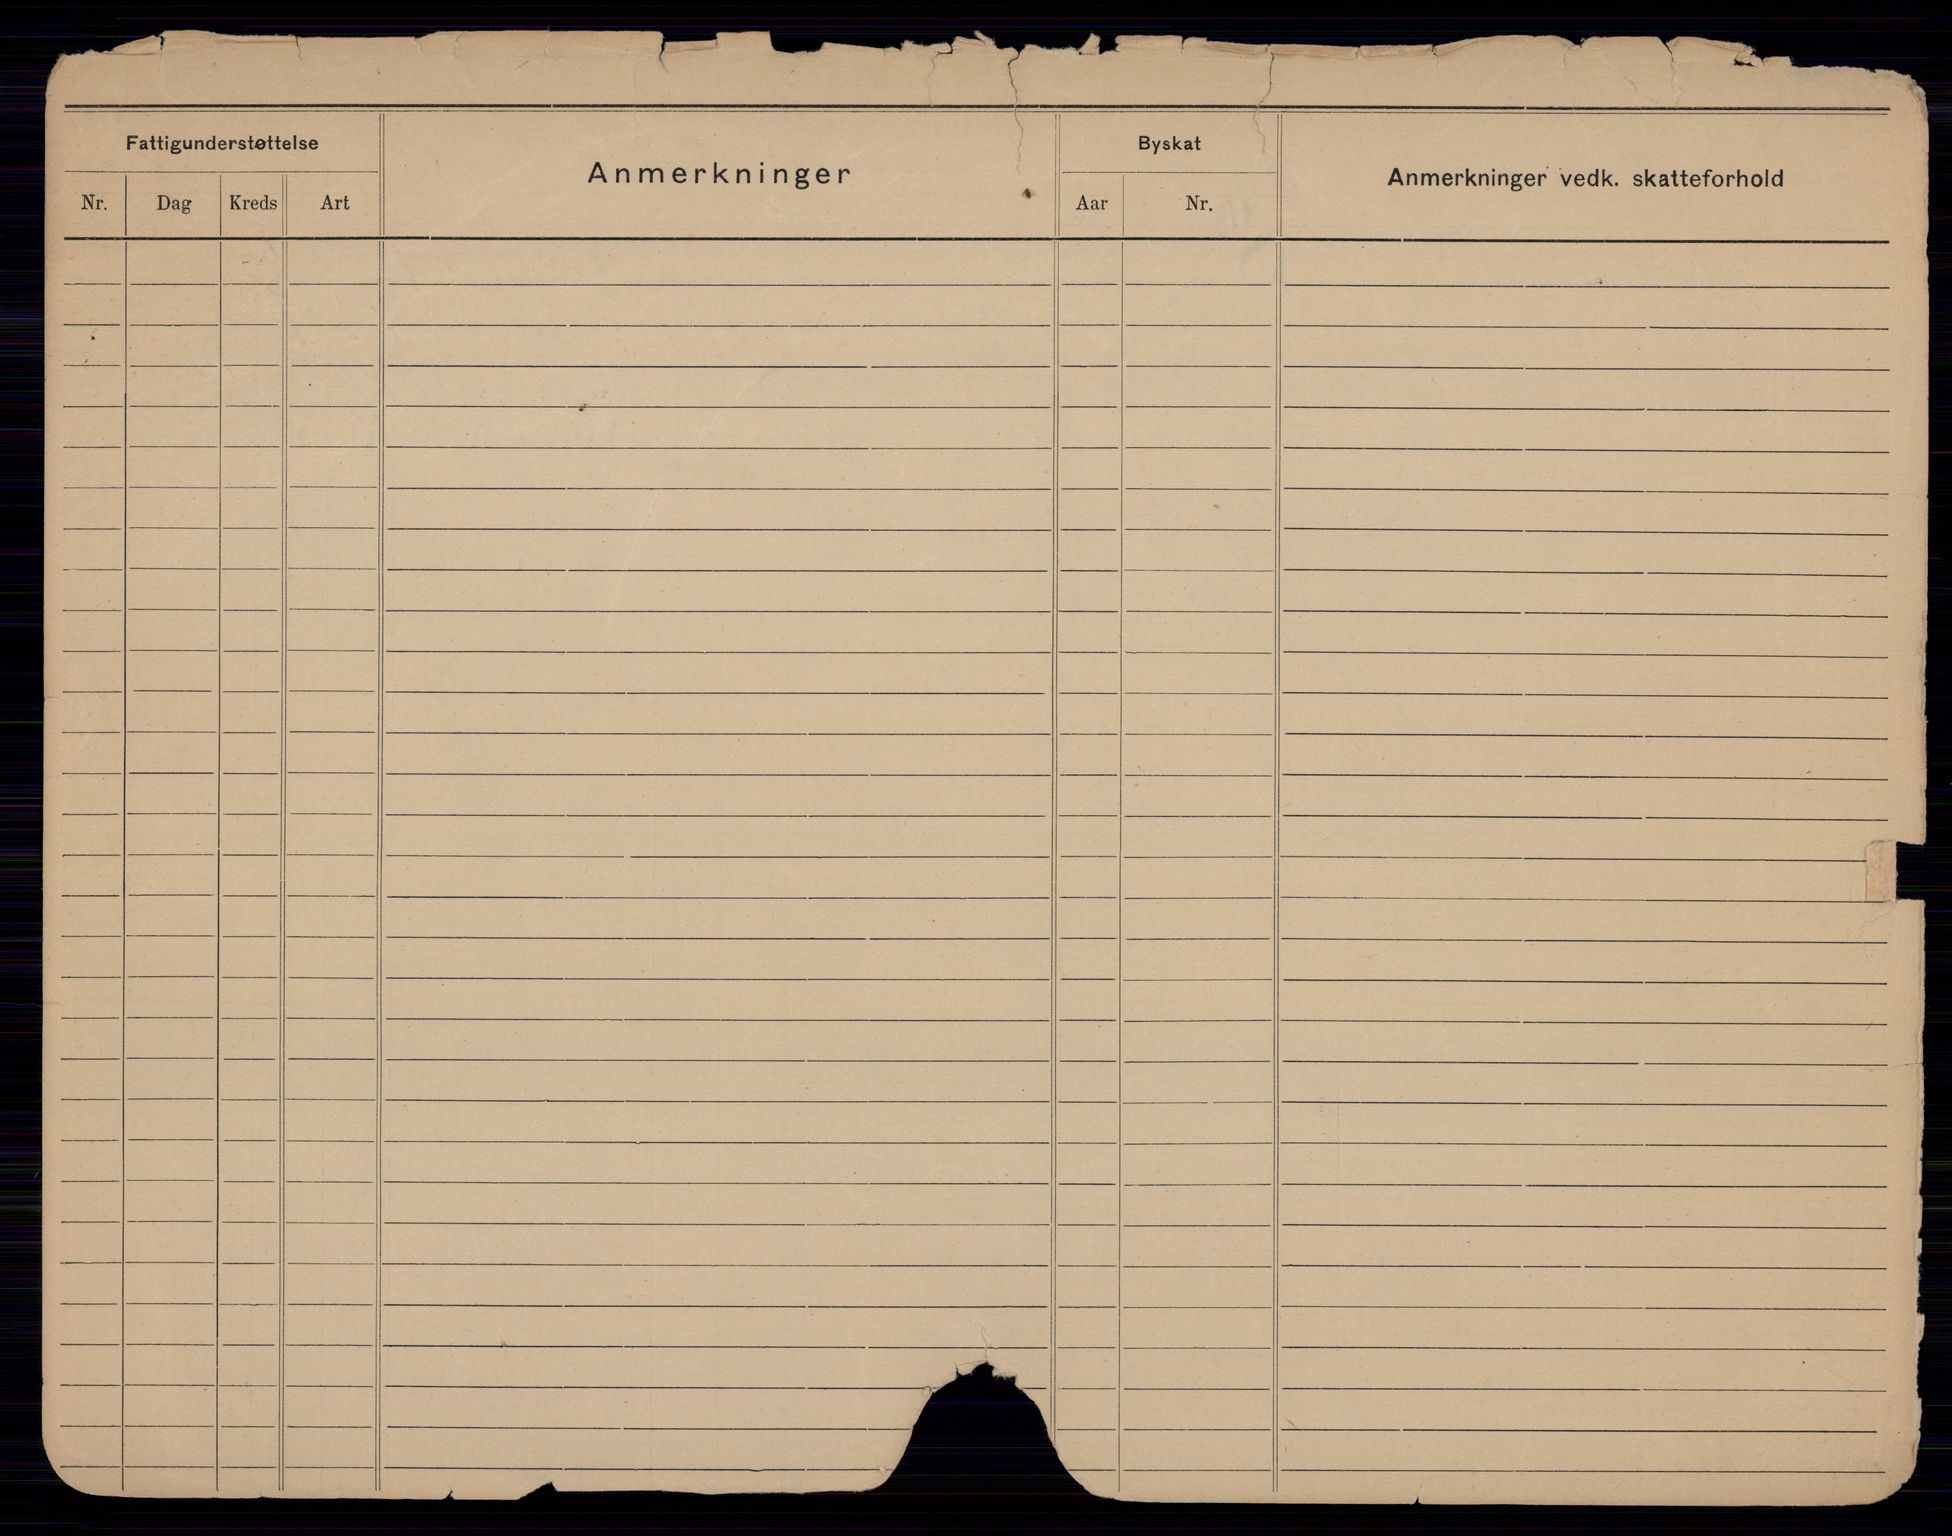 SAO, Oslo folkeregister, Registerkort, G/Gb/L0022: Kvinner, 1916